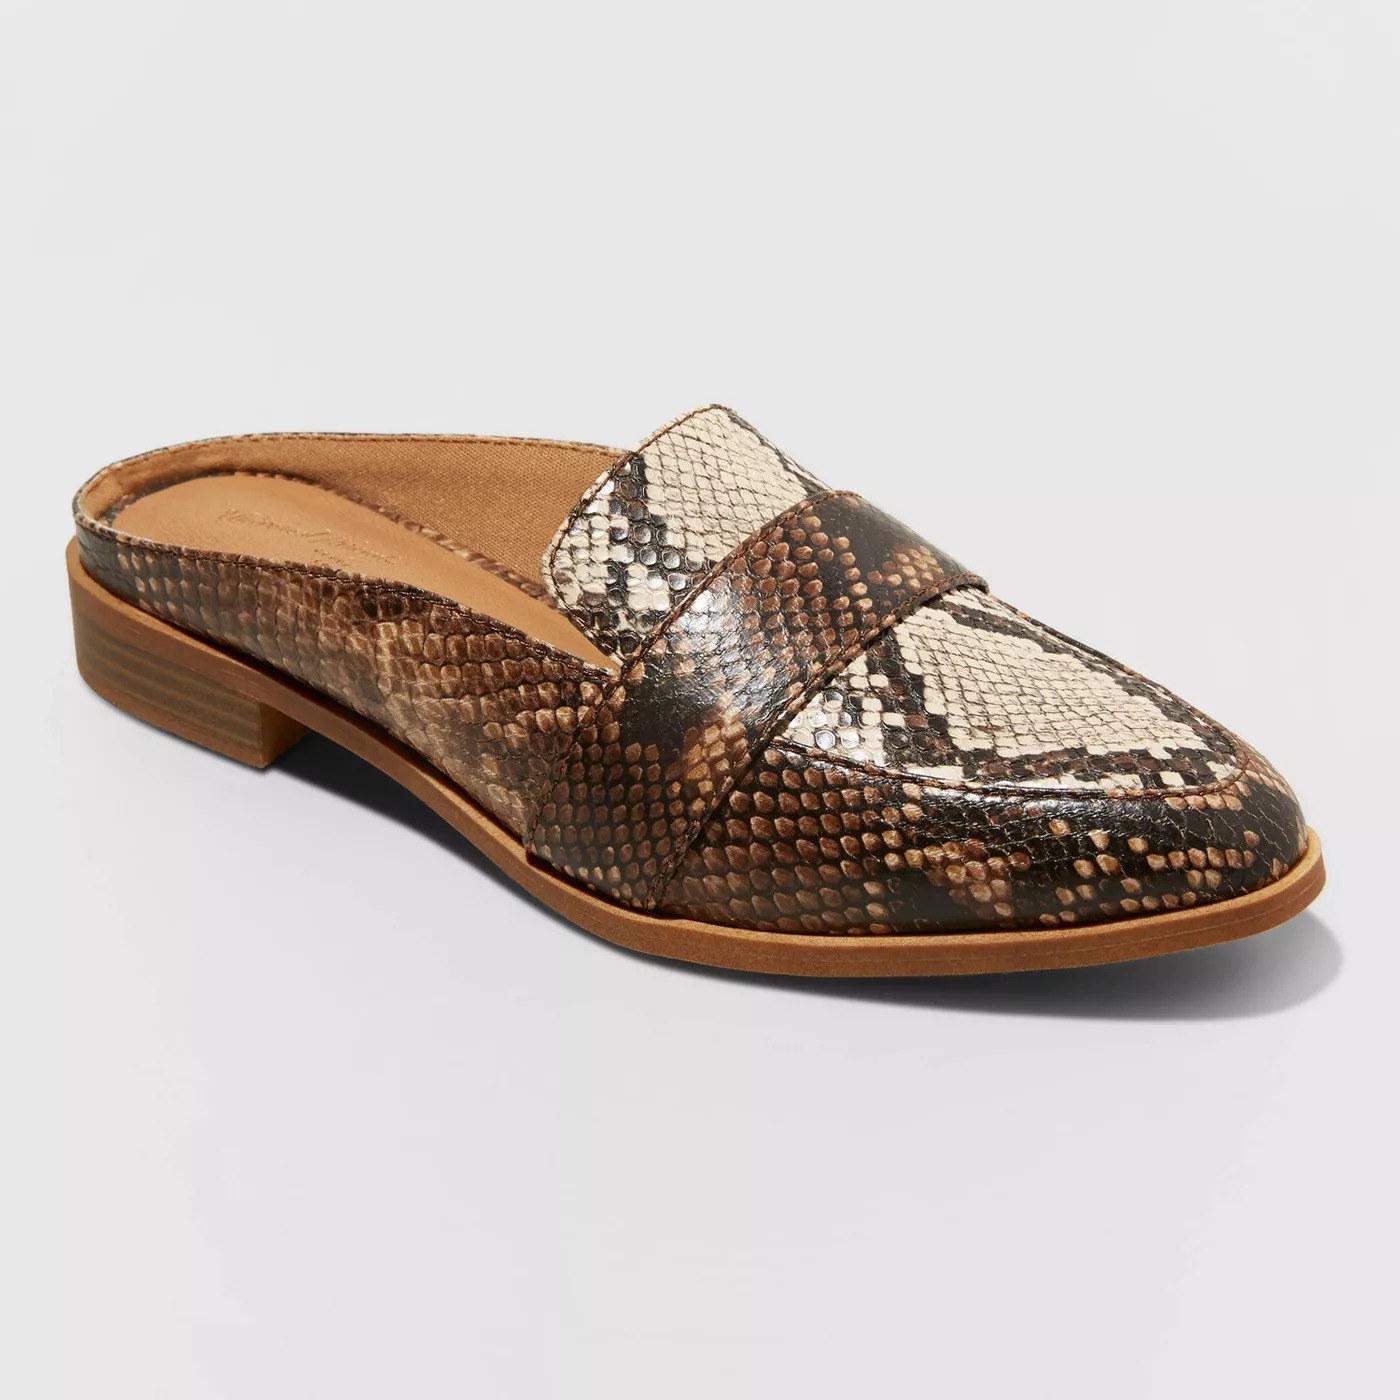 brown beige and grey snakeskin mule loafers